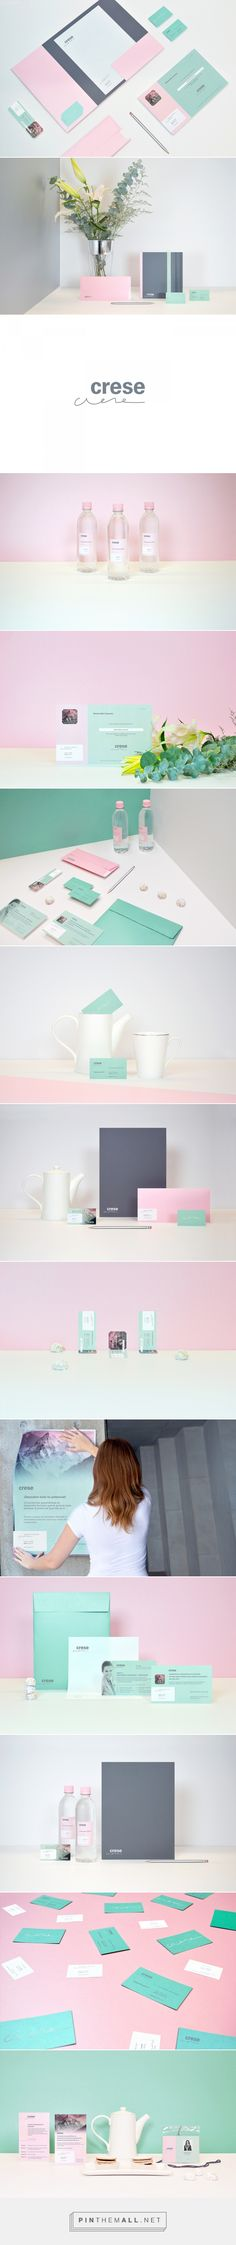 CRESE Branding by Open Studio by K on Behance   Fivestar Branding – Design and Branding Agency & Inspiration Gallery